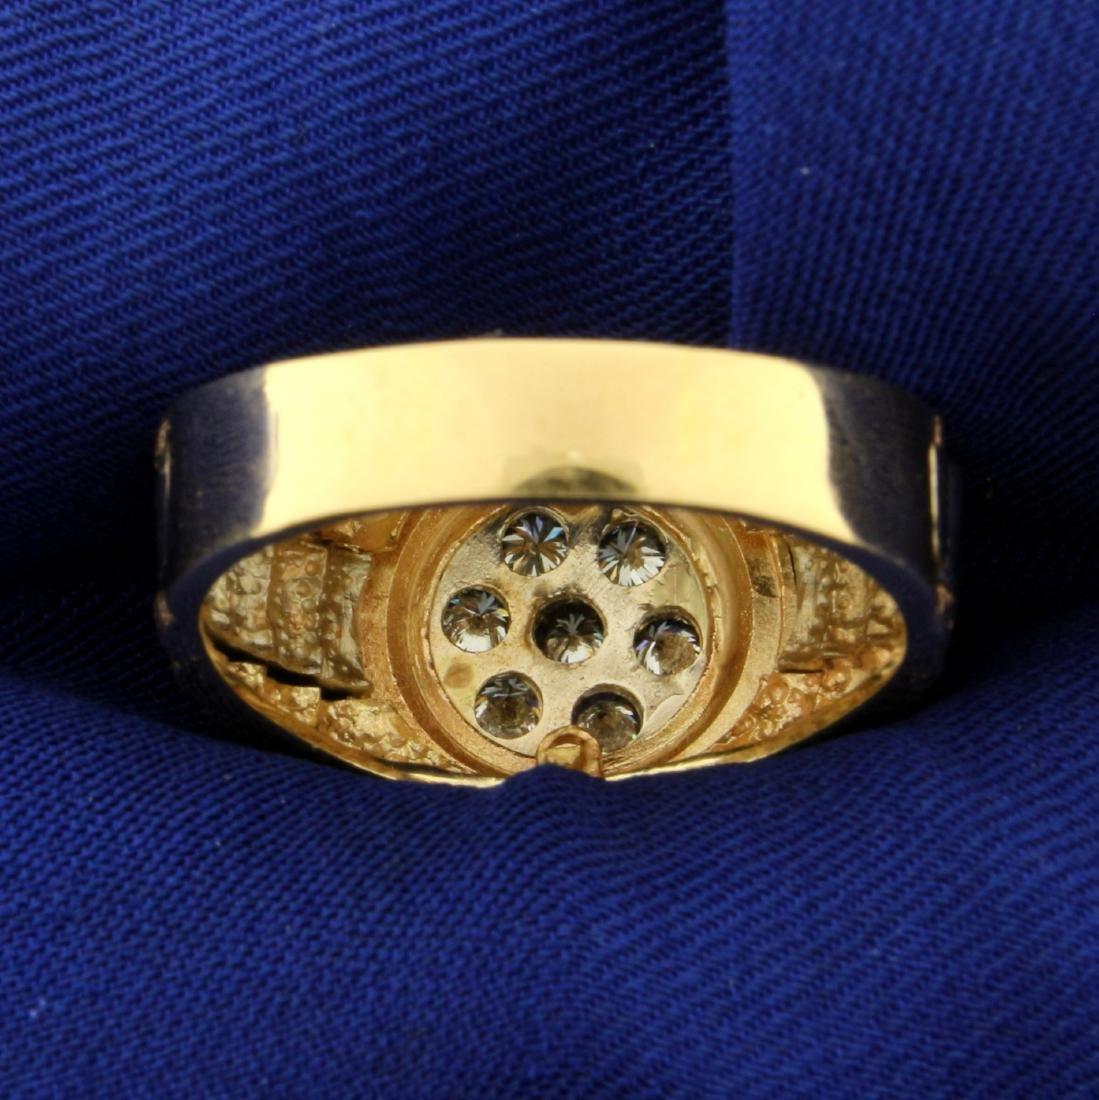 1ct TW Men's Diamond Ring in 14K Yellow Gold - 4